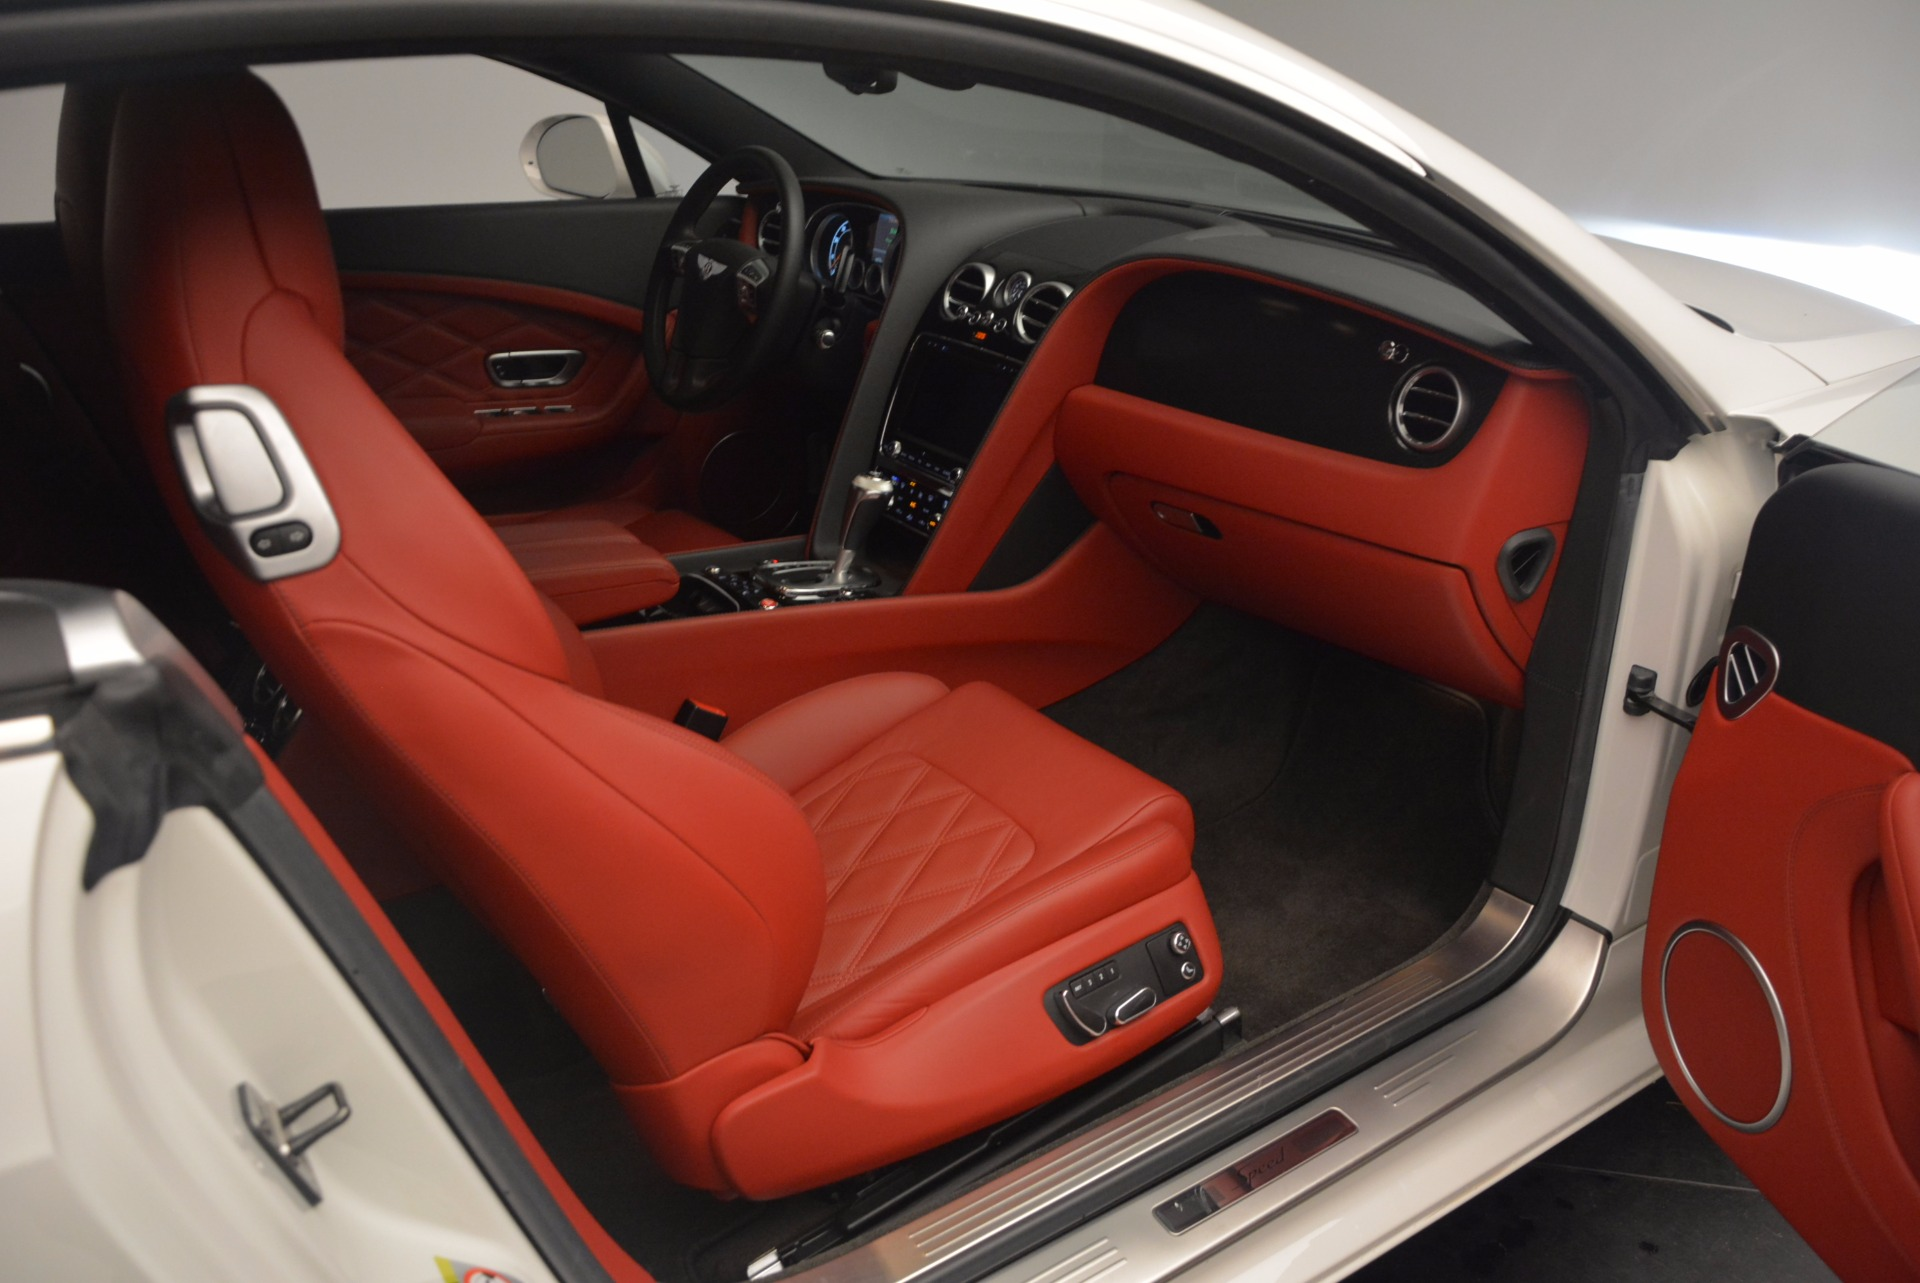 Used 2014 Bentley Continental GT Speed For Sale In Westport, CT 1102_p36